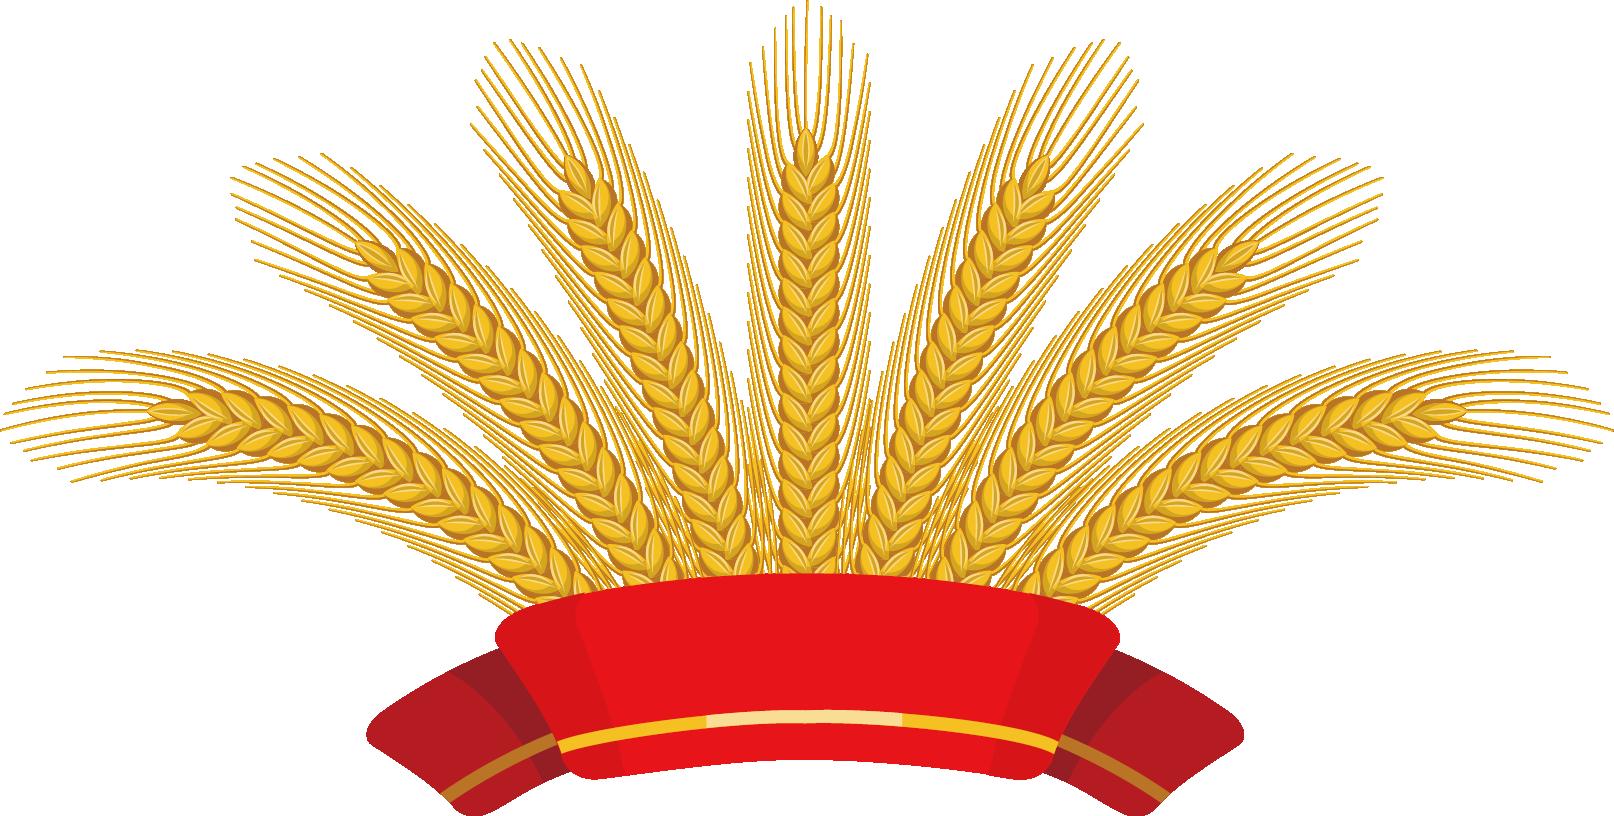 Common ear clip art. Wheat clipart wheat harvest